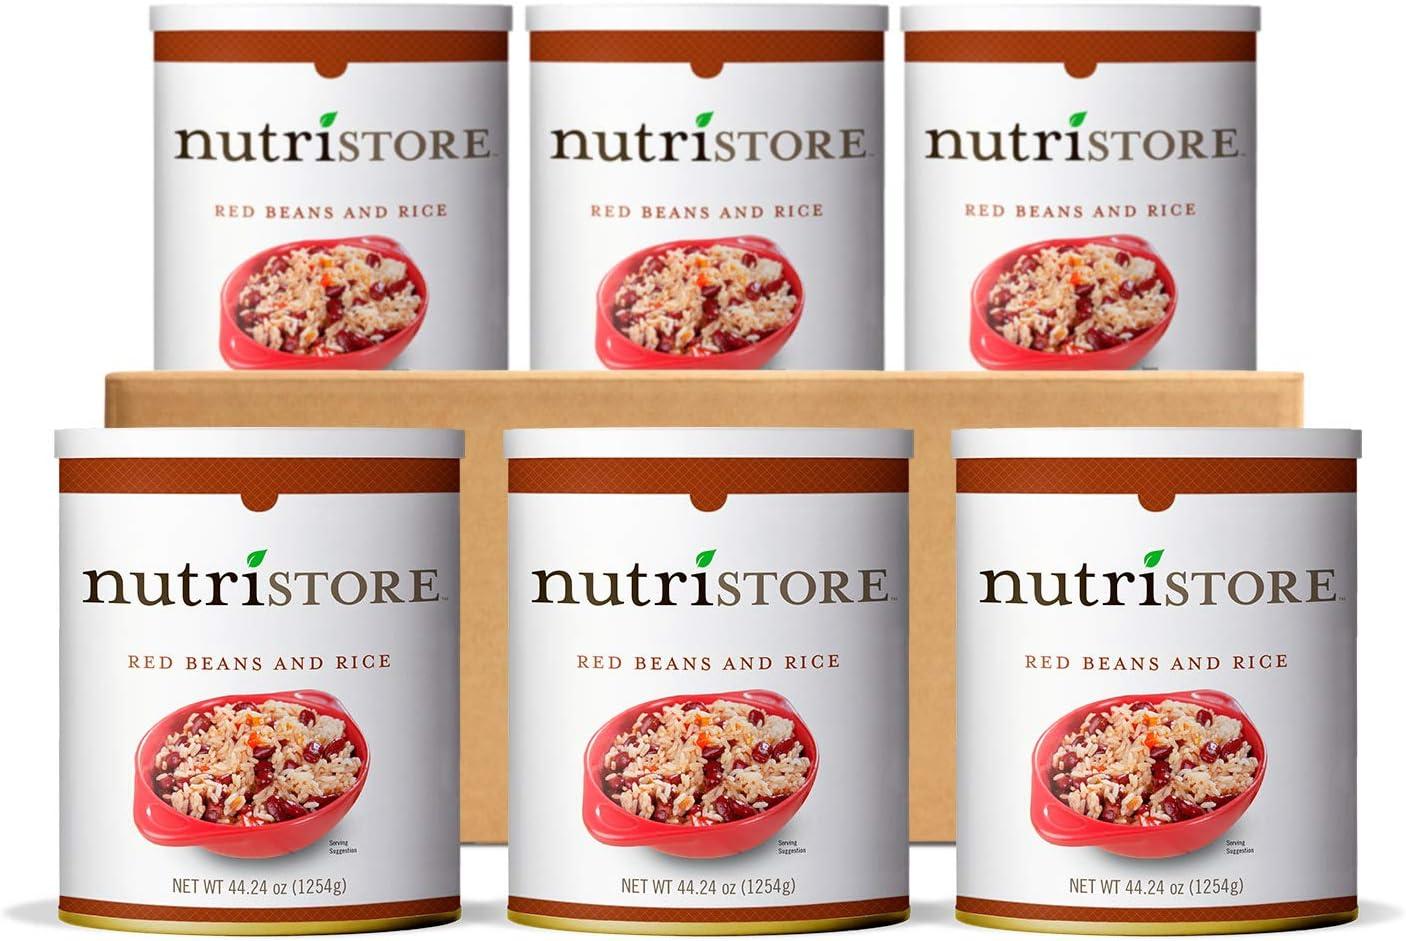 Nutristore Bulk Emergency Food Supply | Premium Freeze-Dried Variety Meals | 6-Packs | Breakfast, Lunch, Dinner | MRE | Long Term Survival Storage | 25 Year Shelf Life